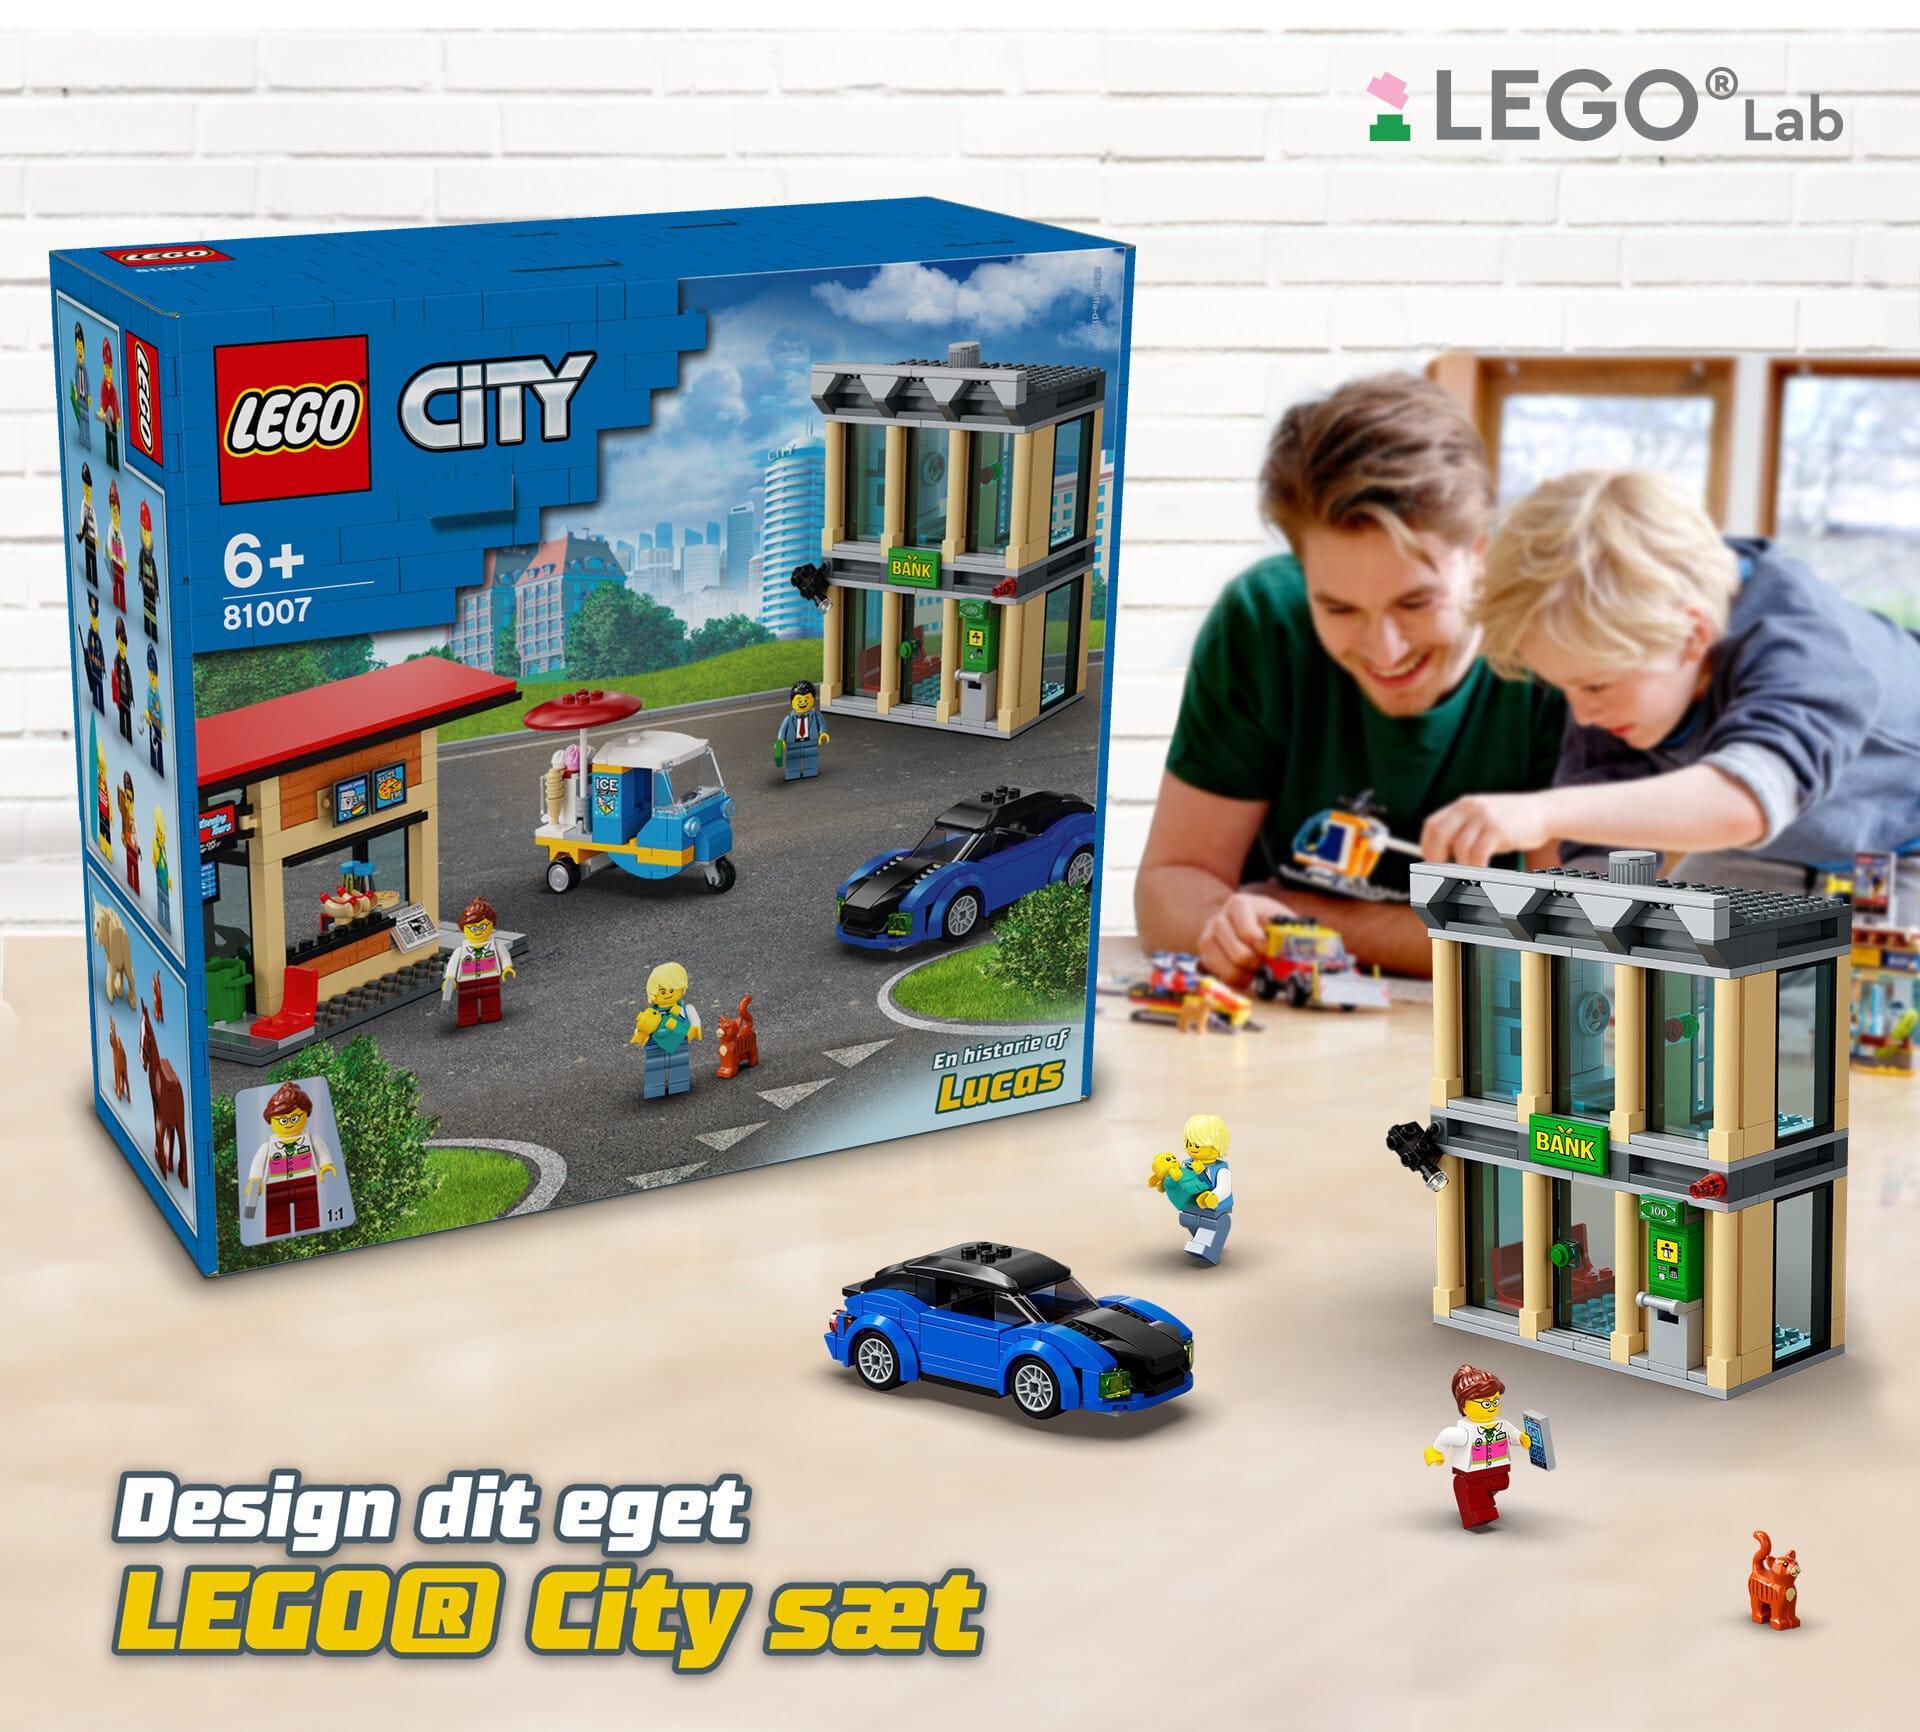 LEGO Lab Designe Dein LEGO City Set 01